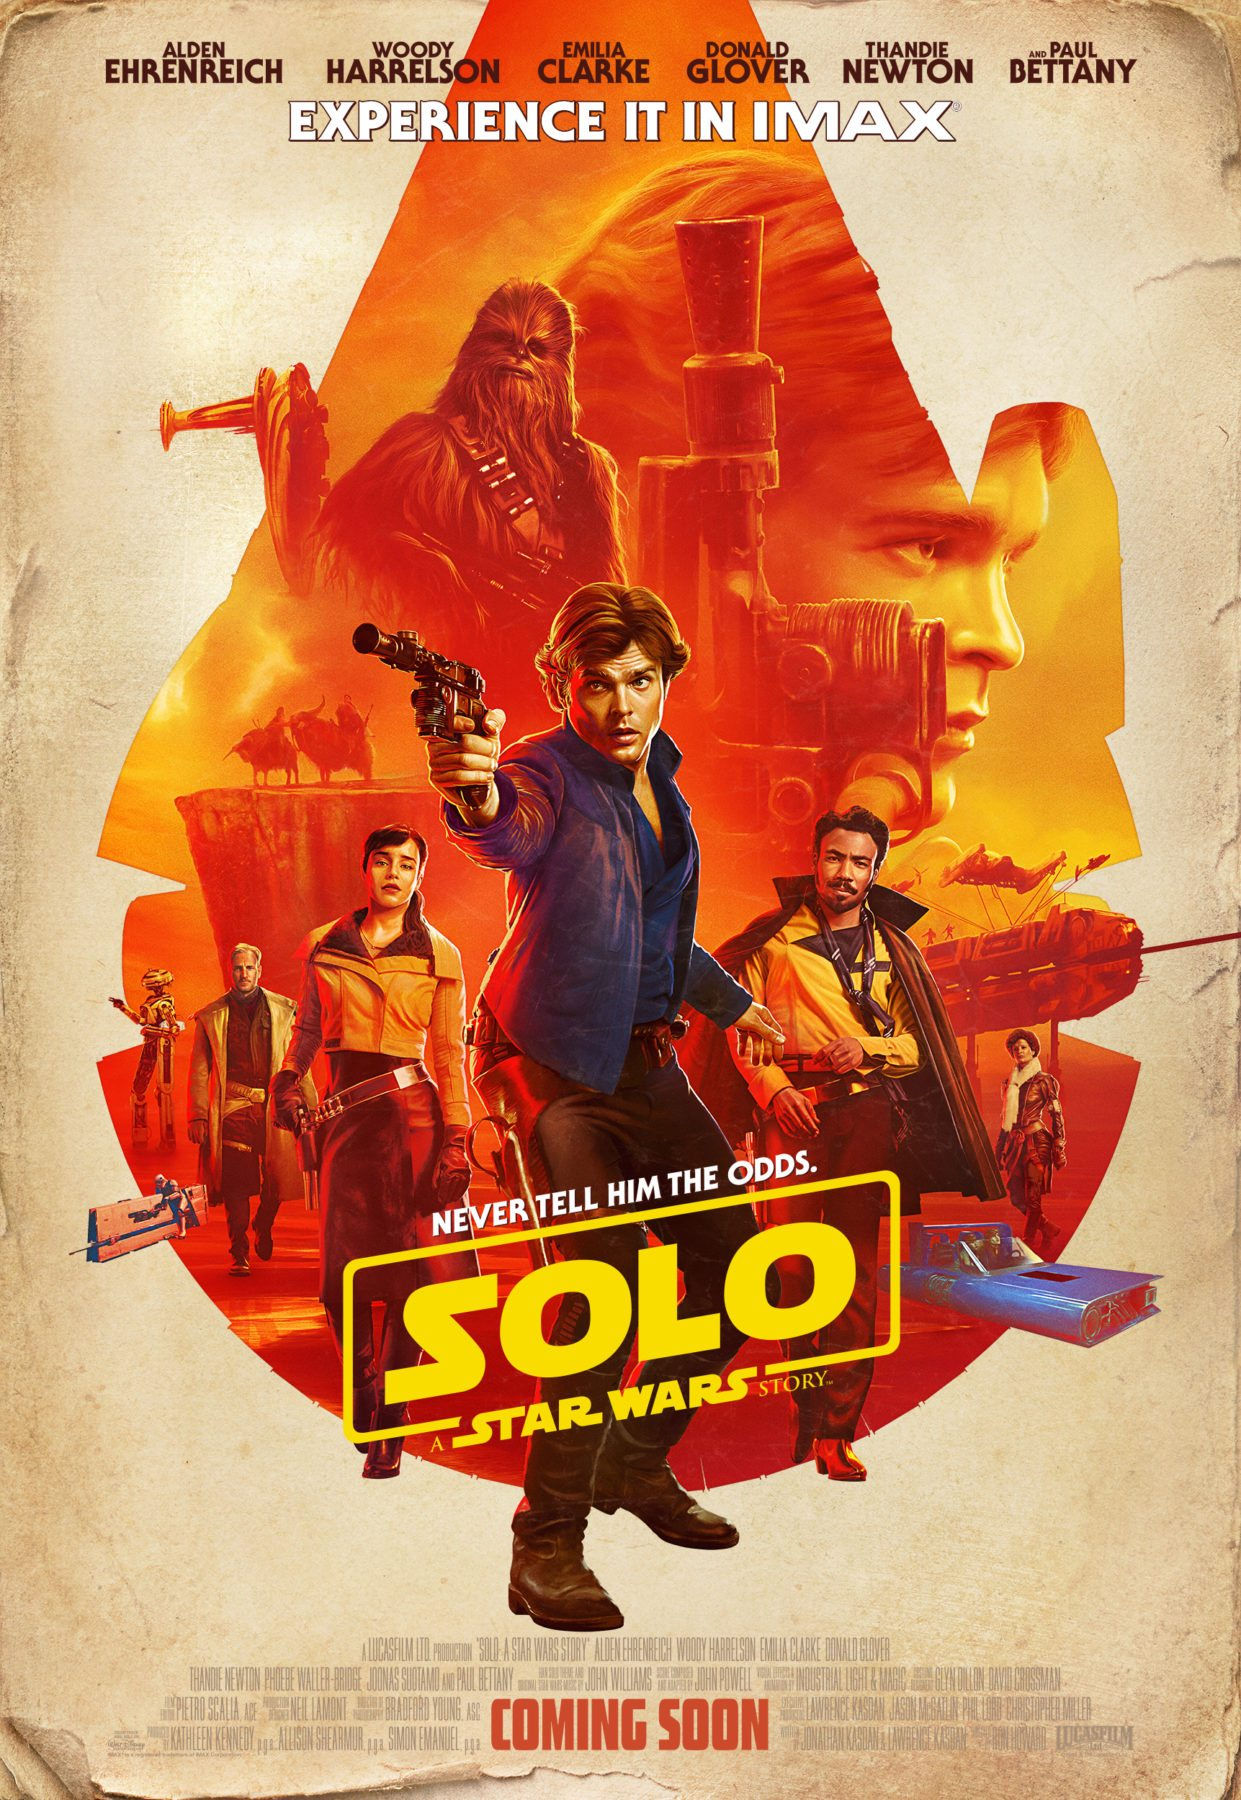 Solo: A Star Wars Story recibe un nuevo póster IMAX a medida que se revela la lista de canciones